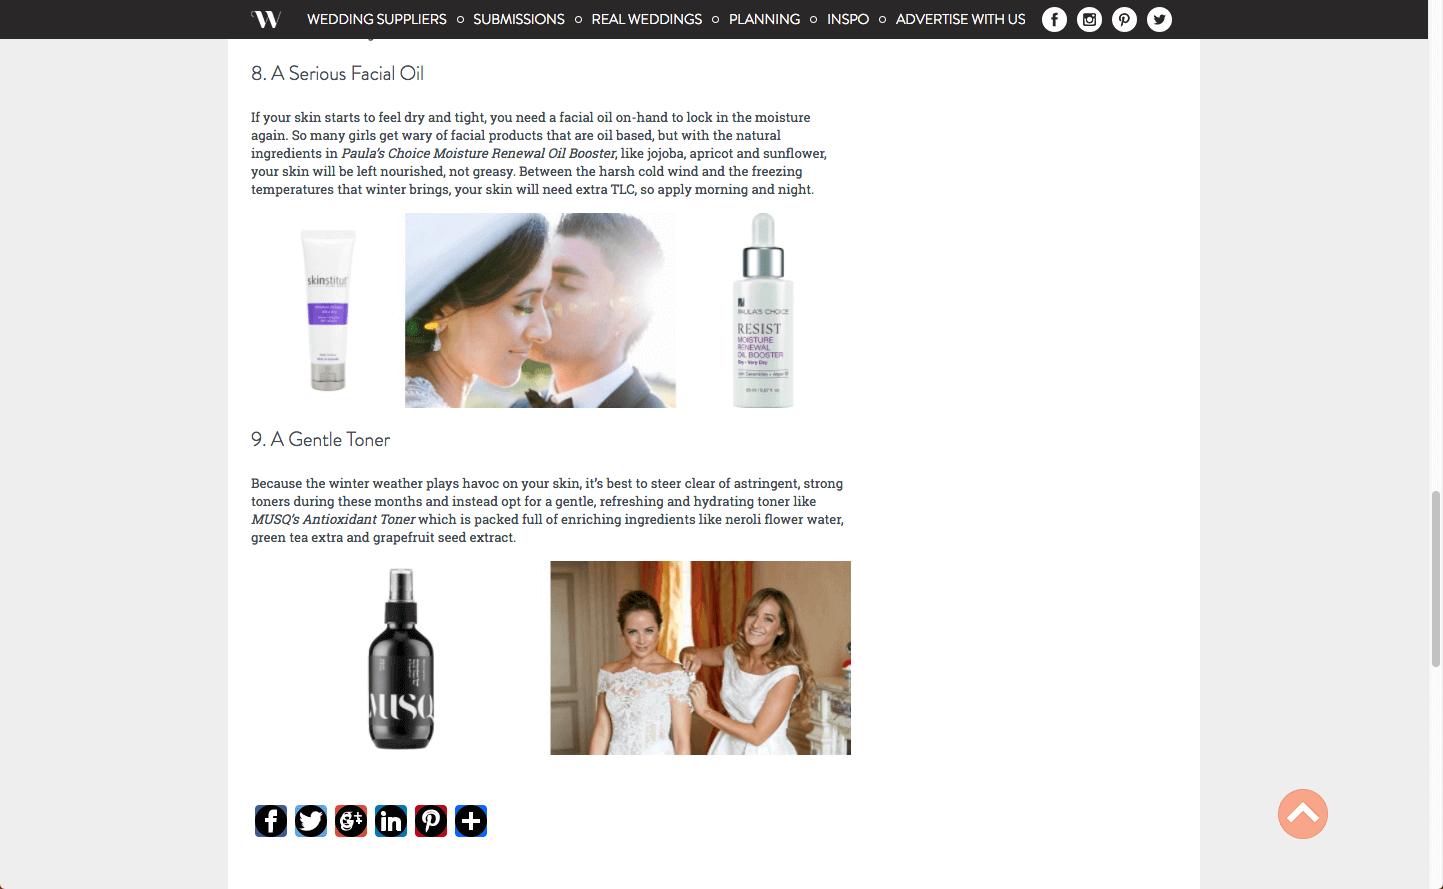 Wedded Wonderland Musq Cosmetics